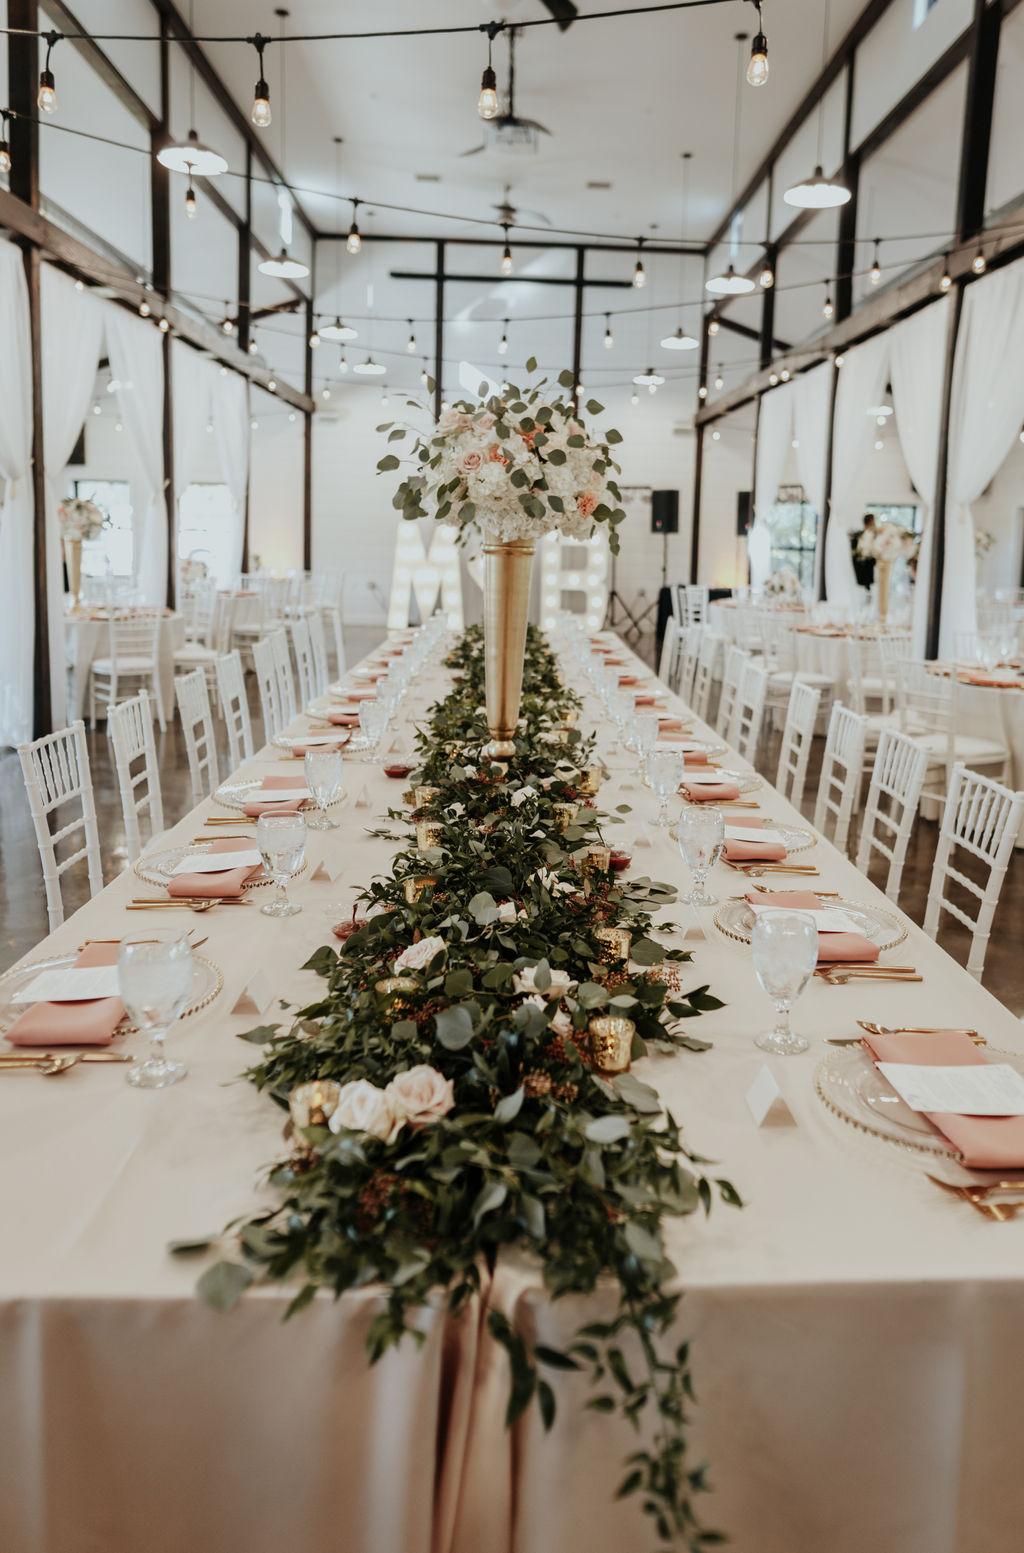 Best Oklahoma Outdoor Wedding Venue Tulsa Bixby White Barn 37.jpg